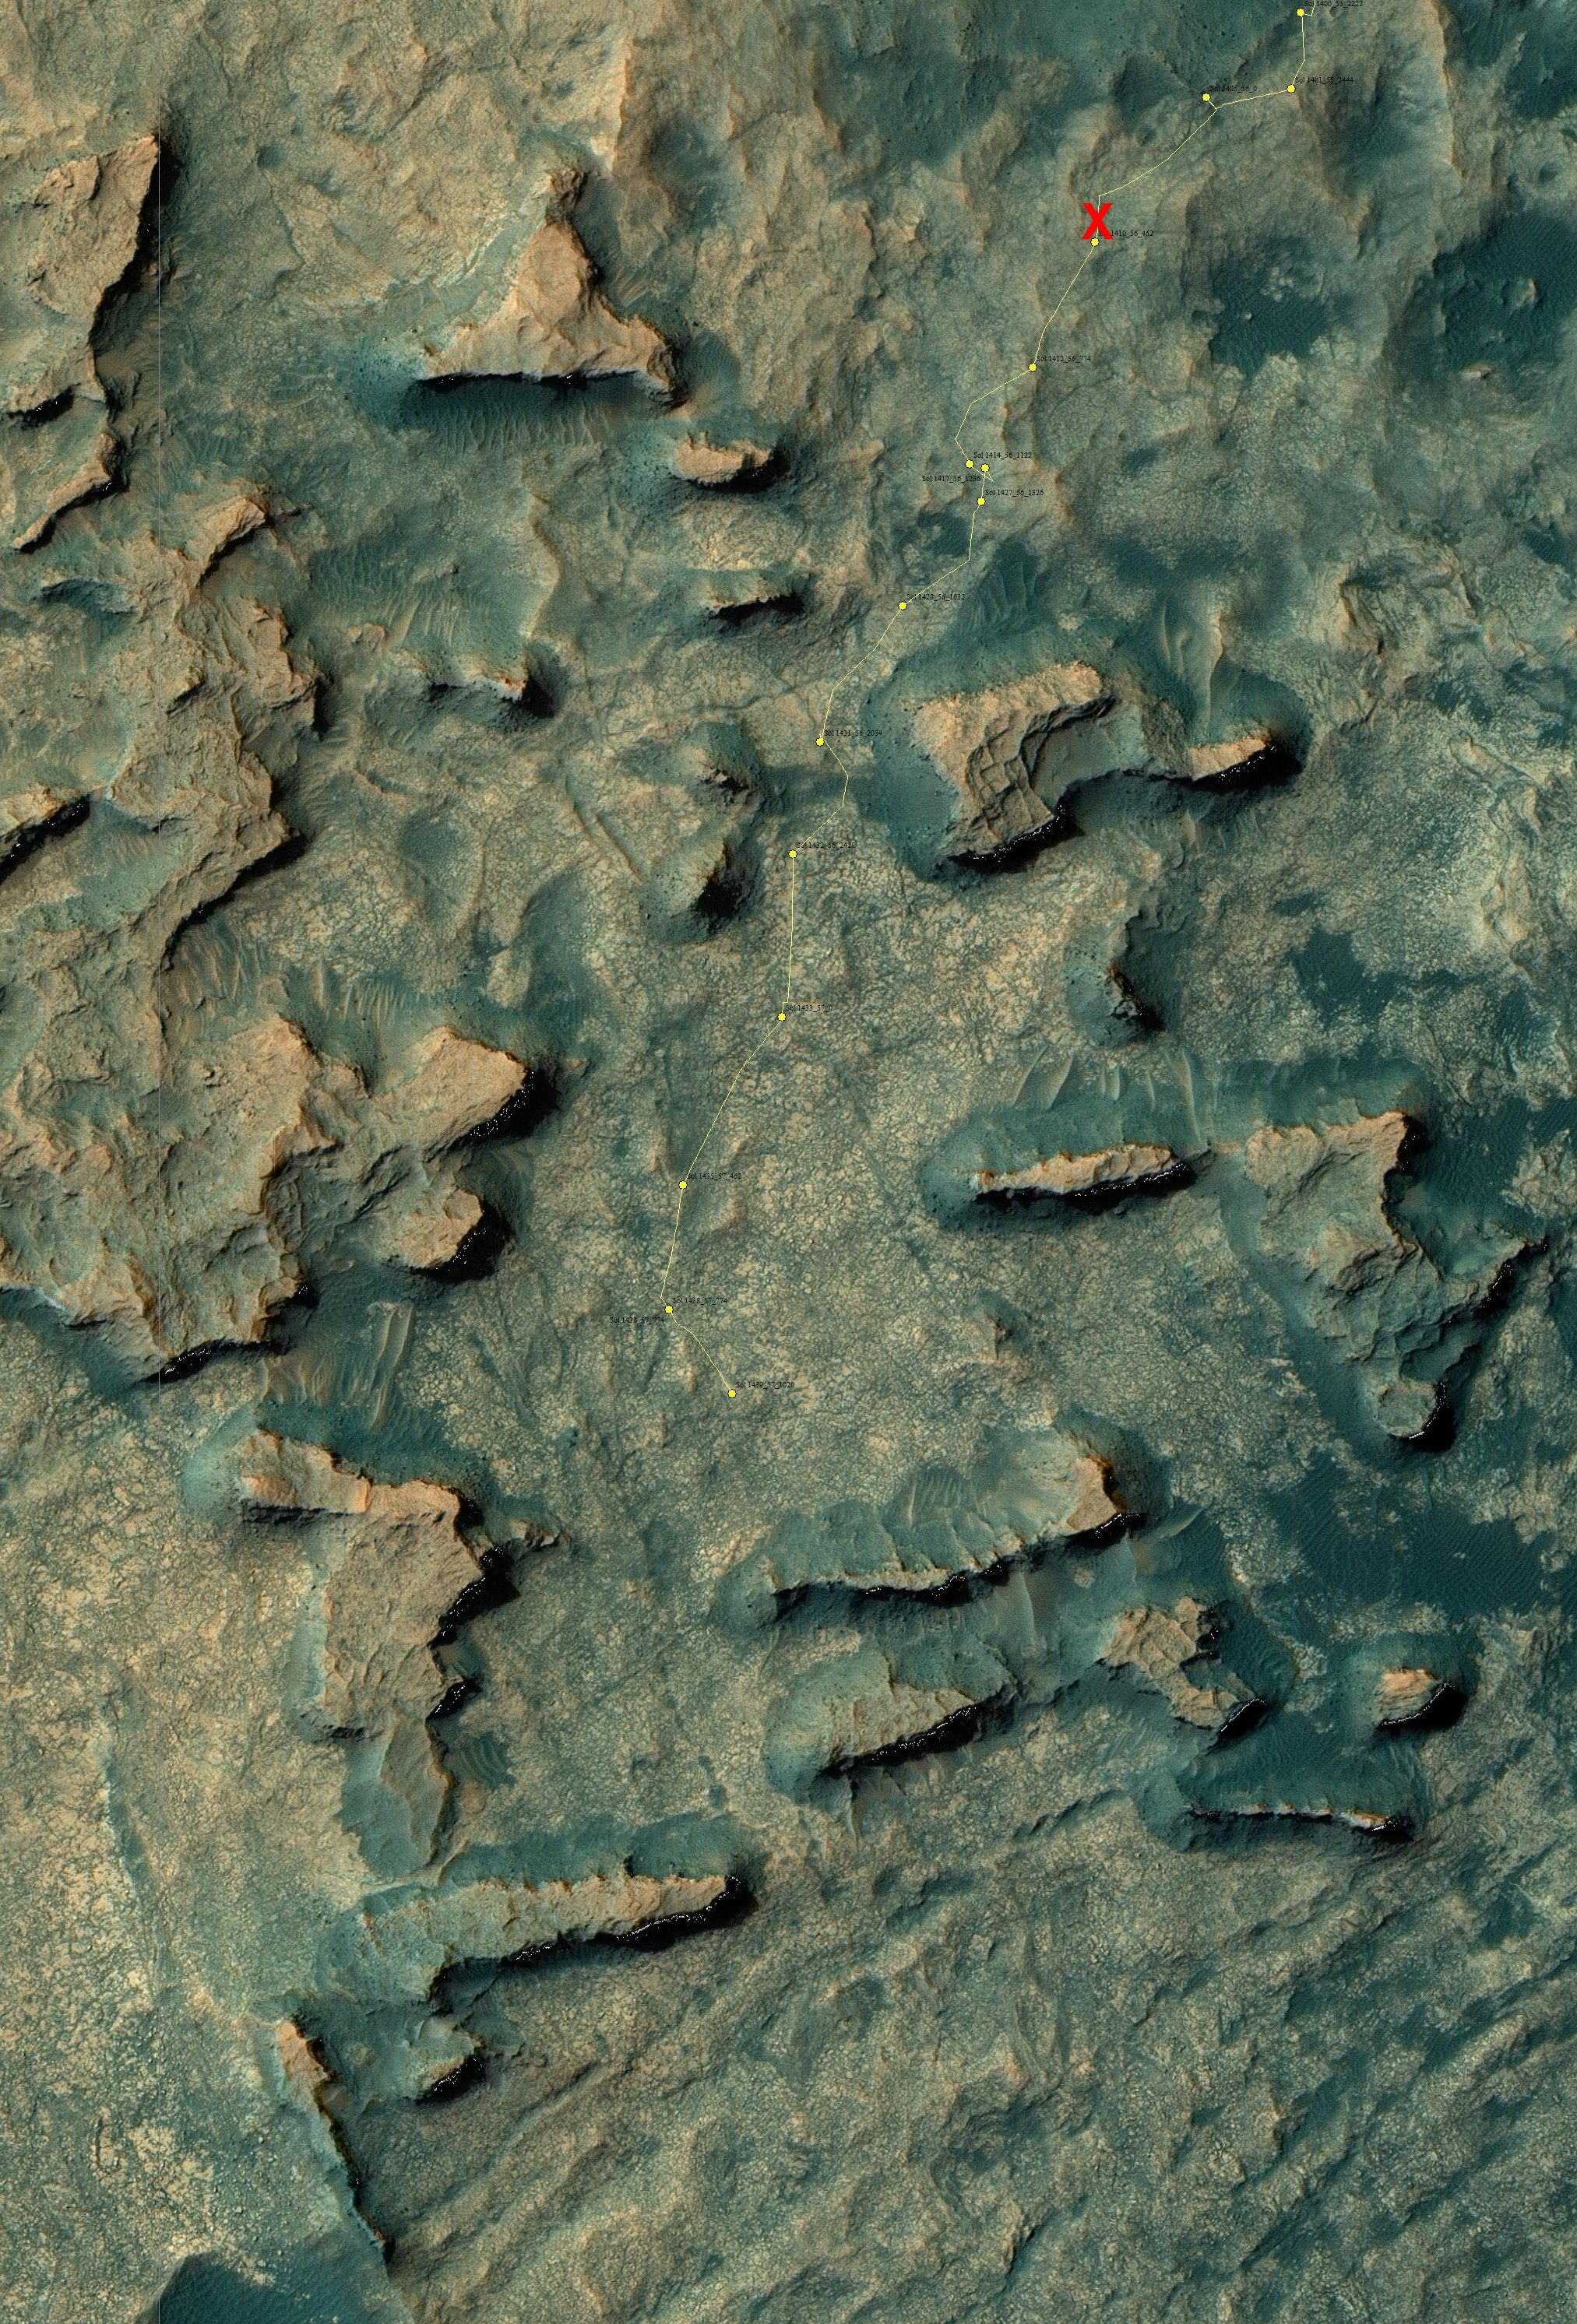 16 08 23 Curiosity_Location_Sol1439-full détail